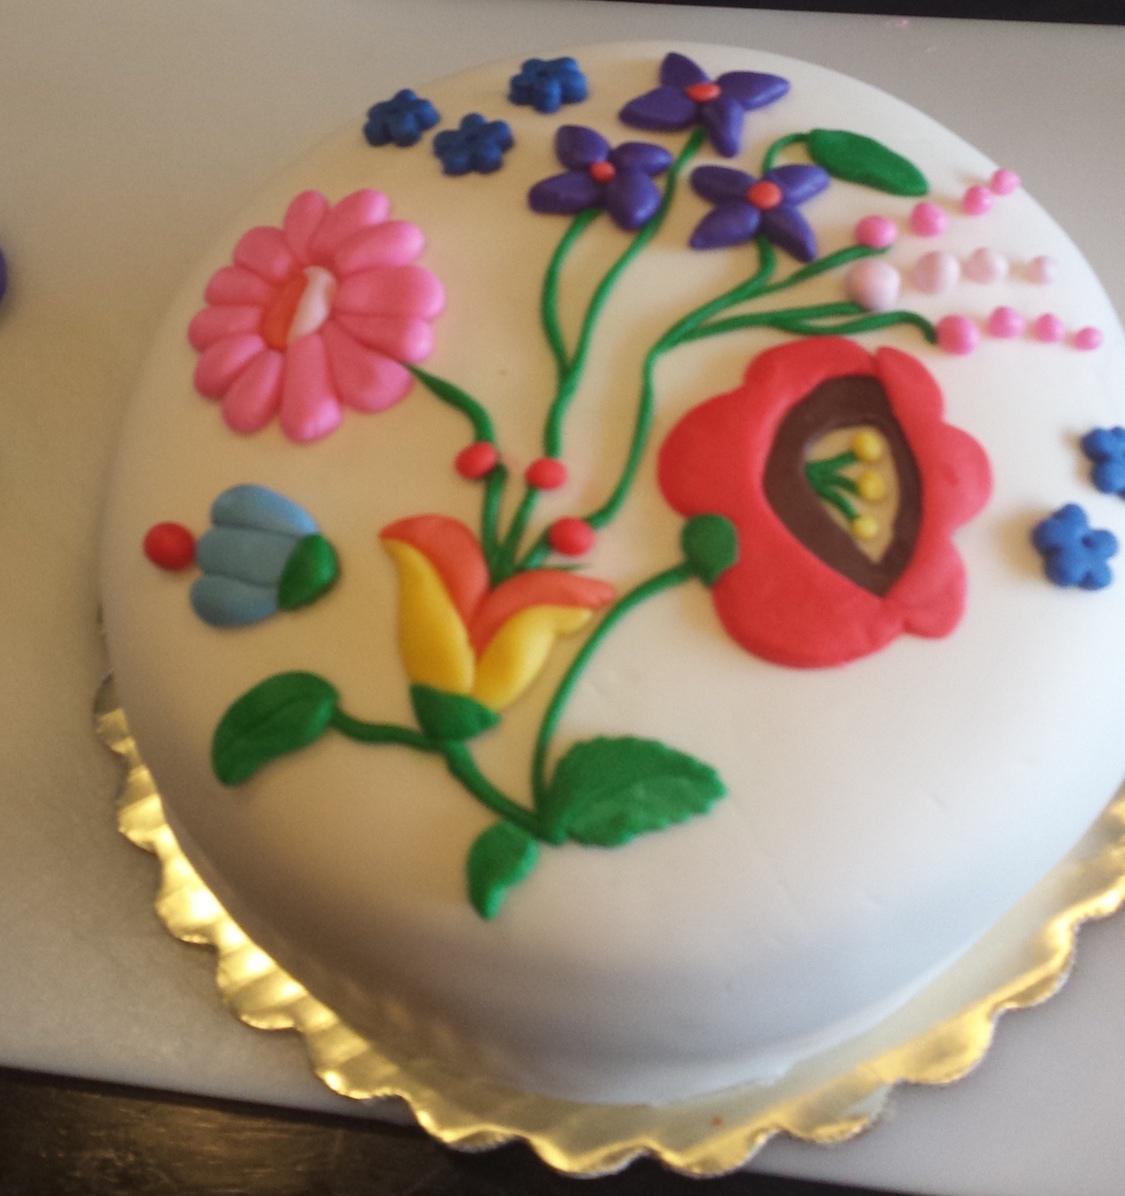 A Kalocsai Torta